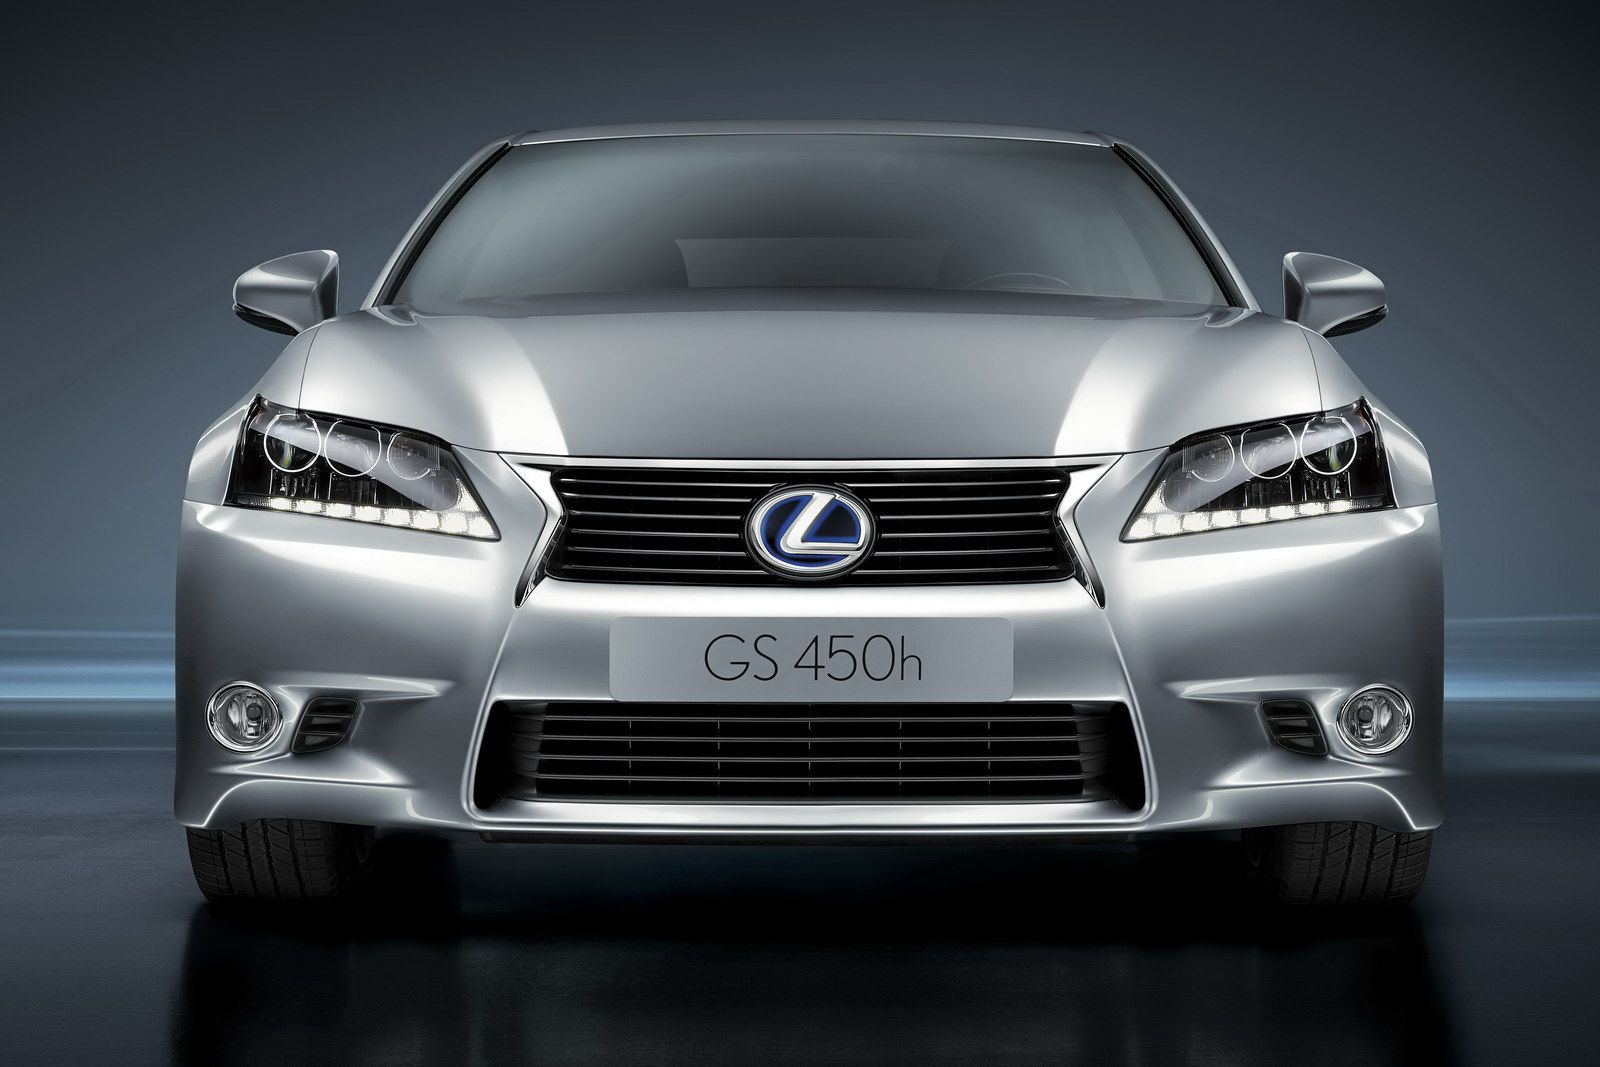 Cool Finest Lexus 450h Awd Lexus 450h, Lexus, Latest cars